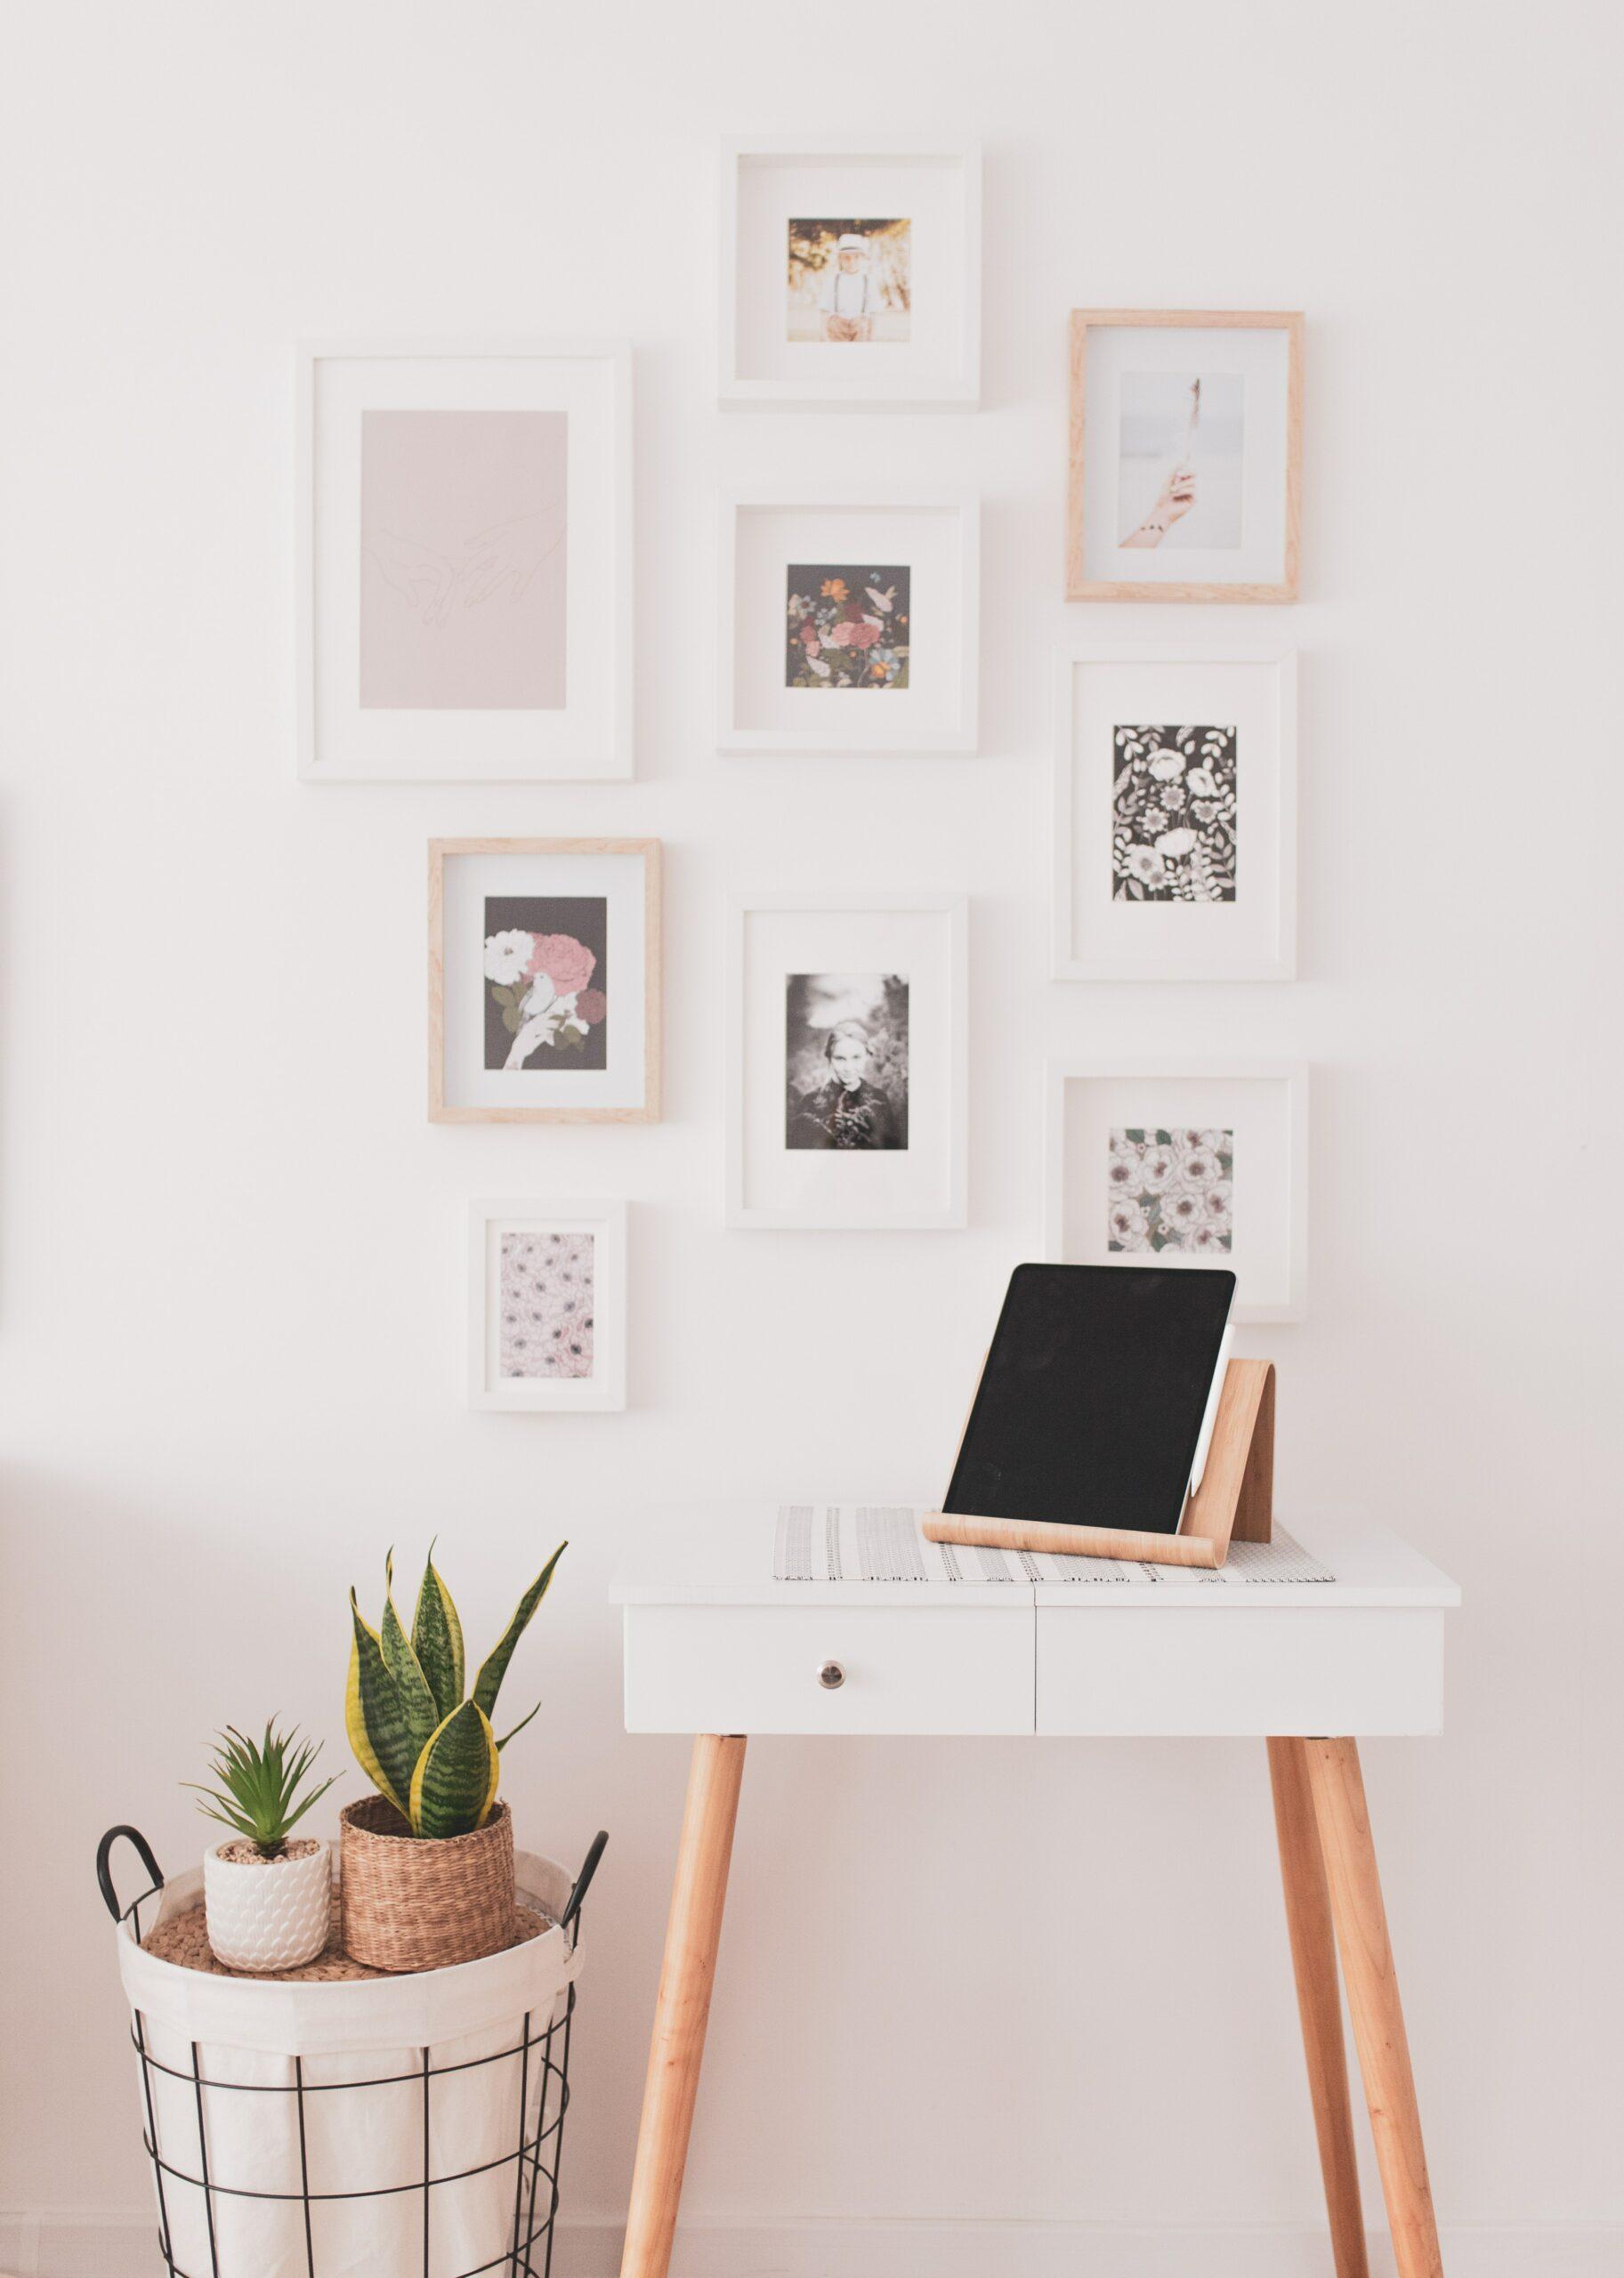 My Ideal Bedroom Decor